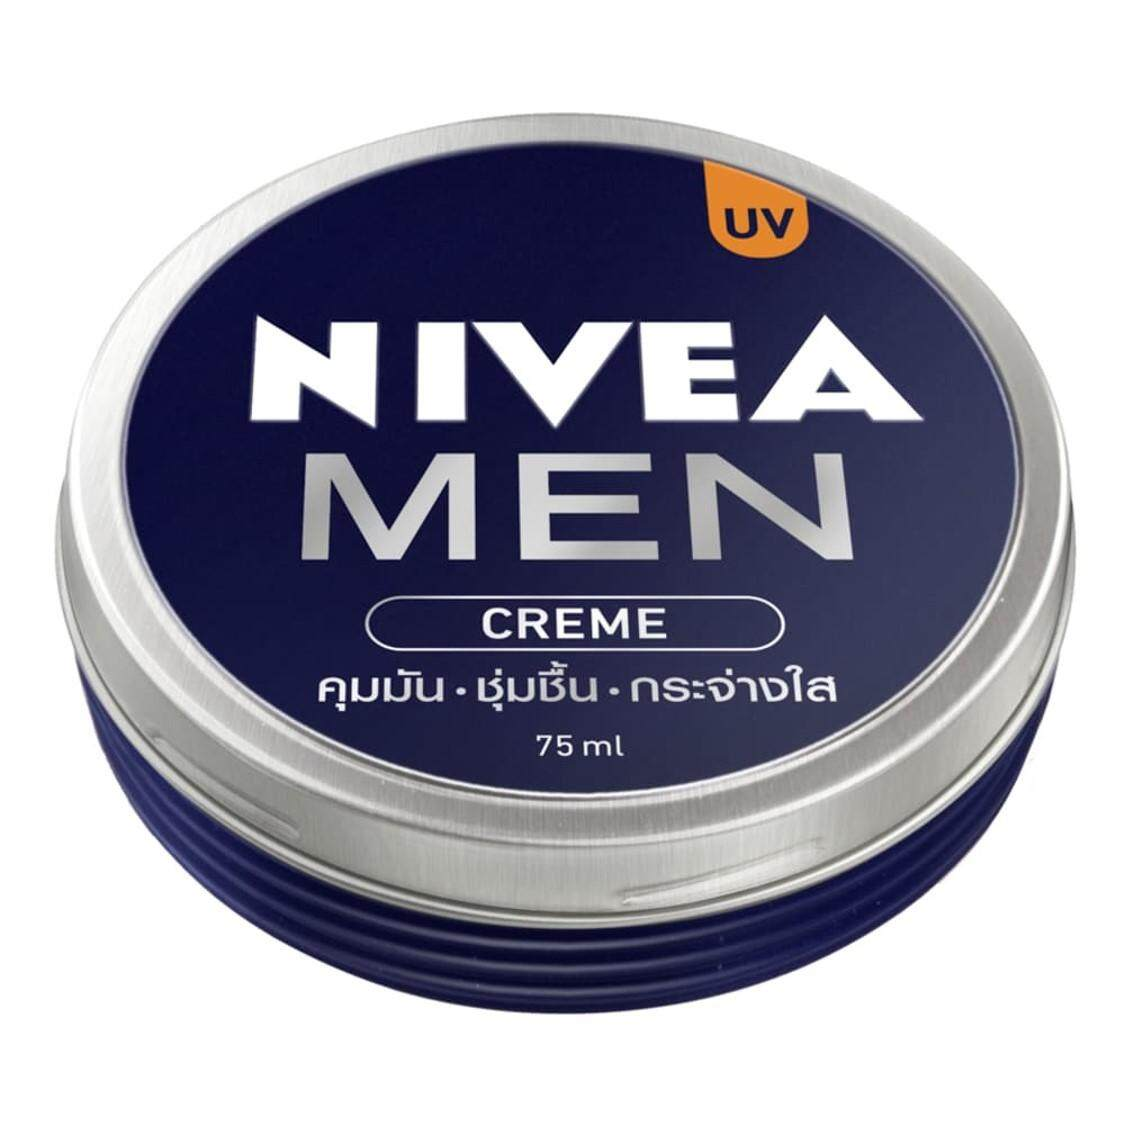 NIVEA MEN UV Creme นีเวีย เมน ยูวี ครีม 75ml.